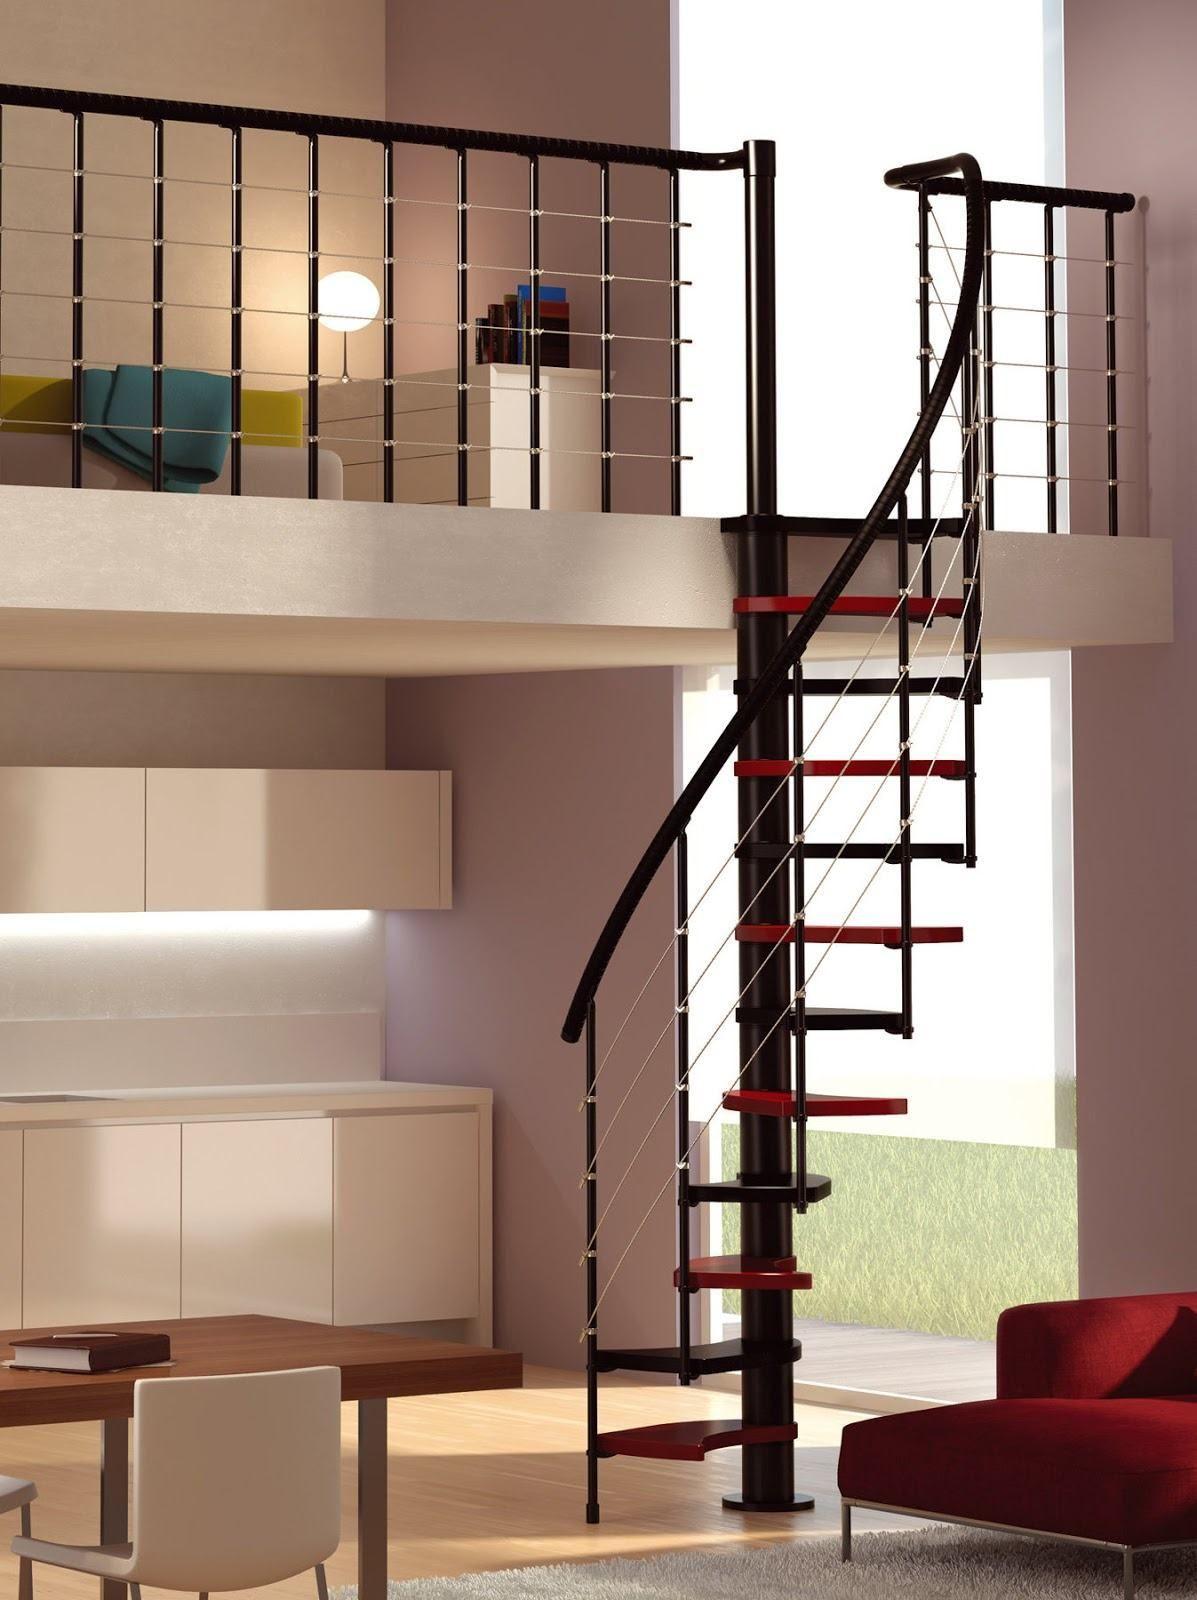 Imagem51 duplex pinterest escalera tapanco y - Escaleras de duplex ...